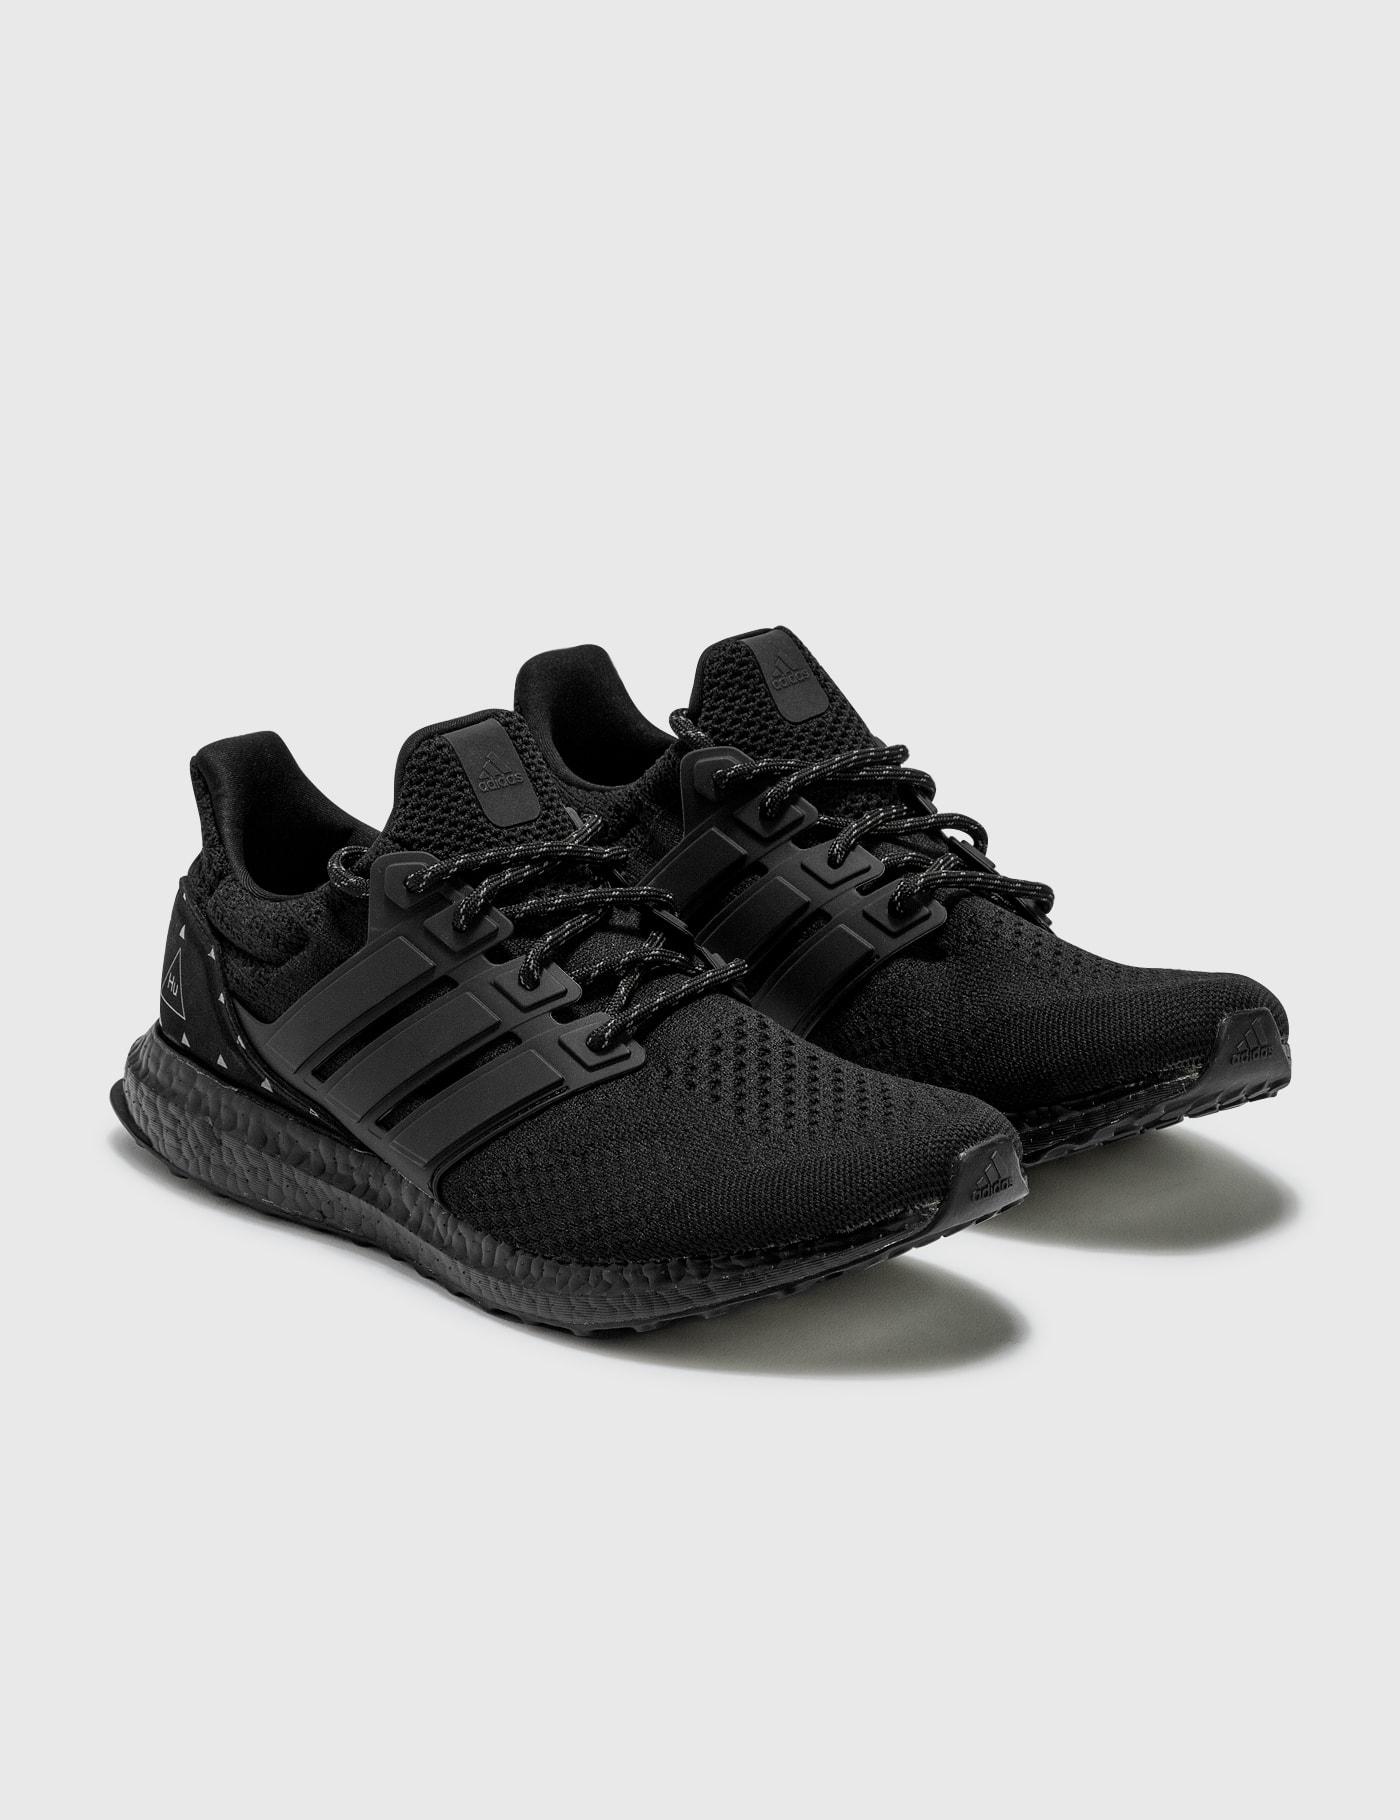 Adidas Originals Activewears PHARRELL WILLIAMS ULTRABOOST DNA